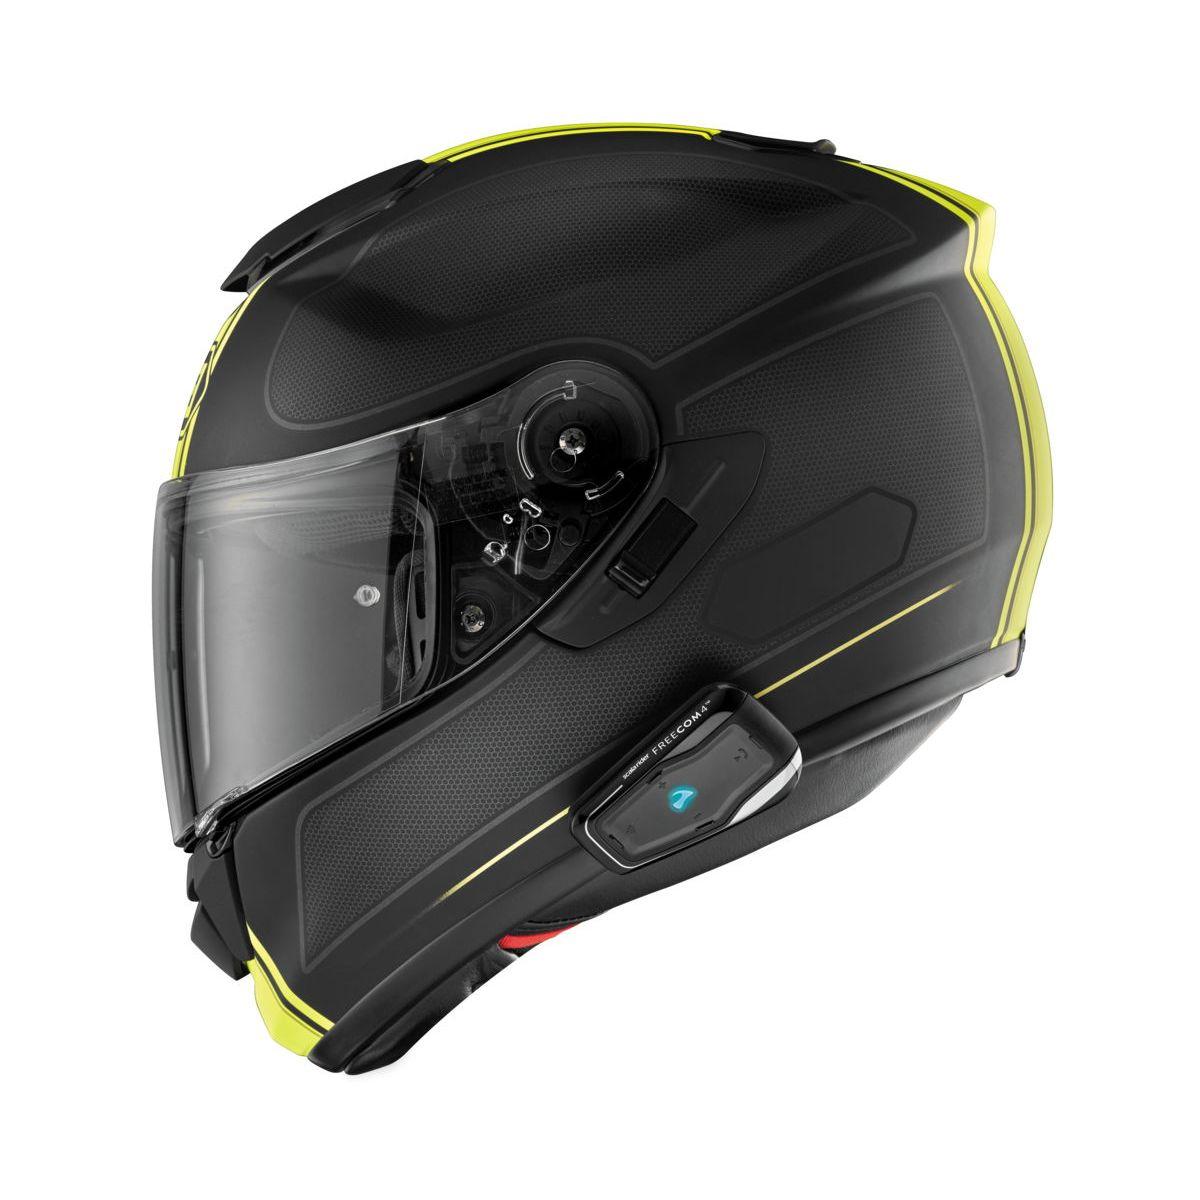 cardo scala freecom 4duo motorcycle 4 way bike bike bluetooth 2 headset intercom sustuu. Black Bedroom Furniture Sets. Home Design Ideas